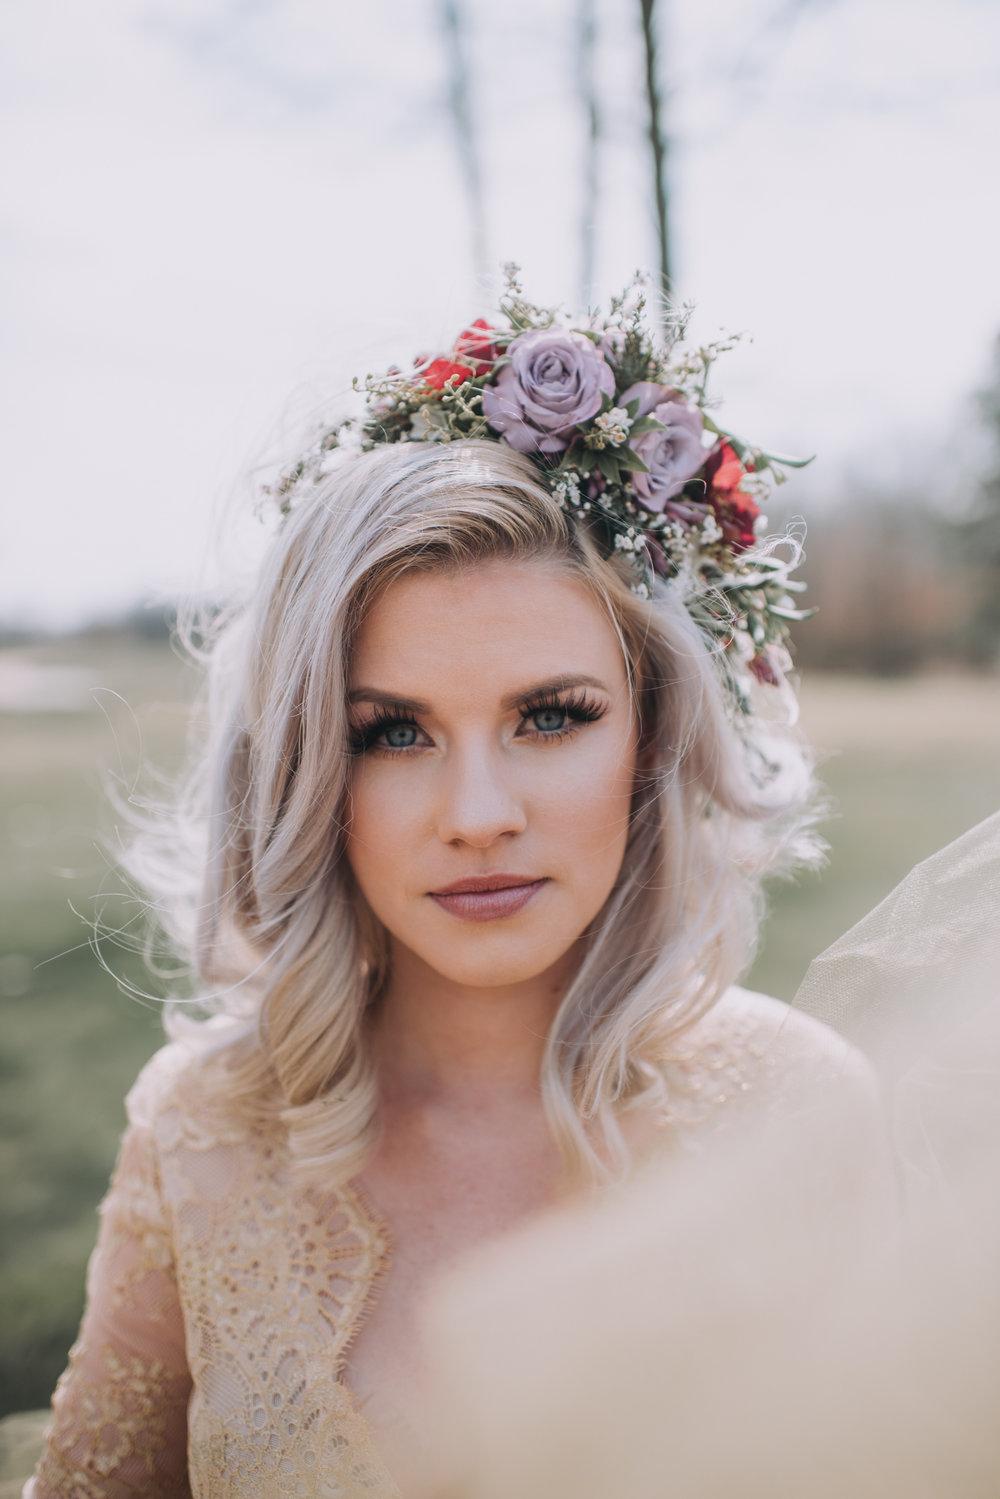 NJ Bride, Running Deer Wedding, Philadelphia Wedding, Flower Crown, Hair Piece, Wedding Makeup, Samantha Jay Photography, Your Day Your Way Hair & Makeup